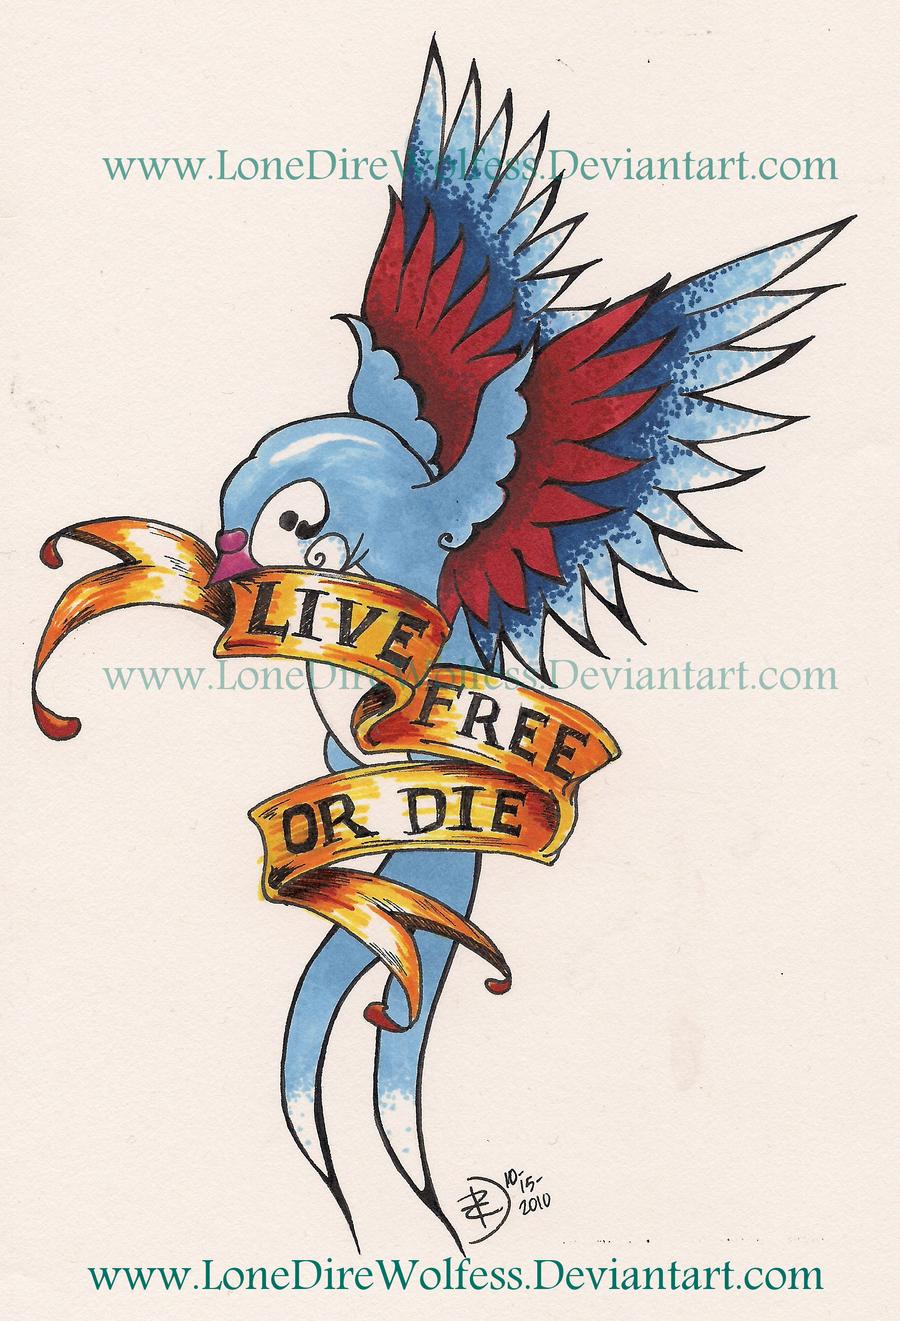 live free or die by lonedirewolfess on deviantart. Black Bedroom Furniture Sets. Home Design Ideas